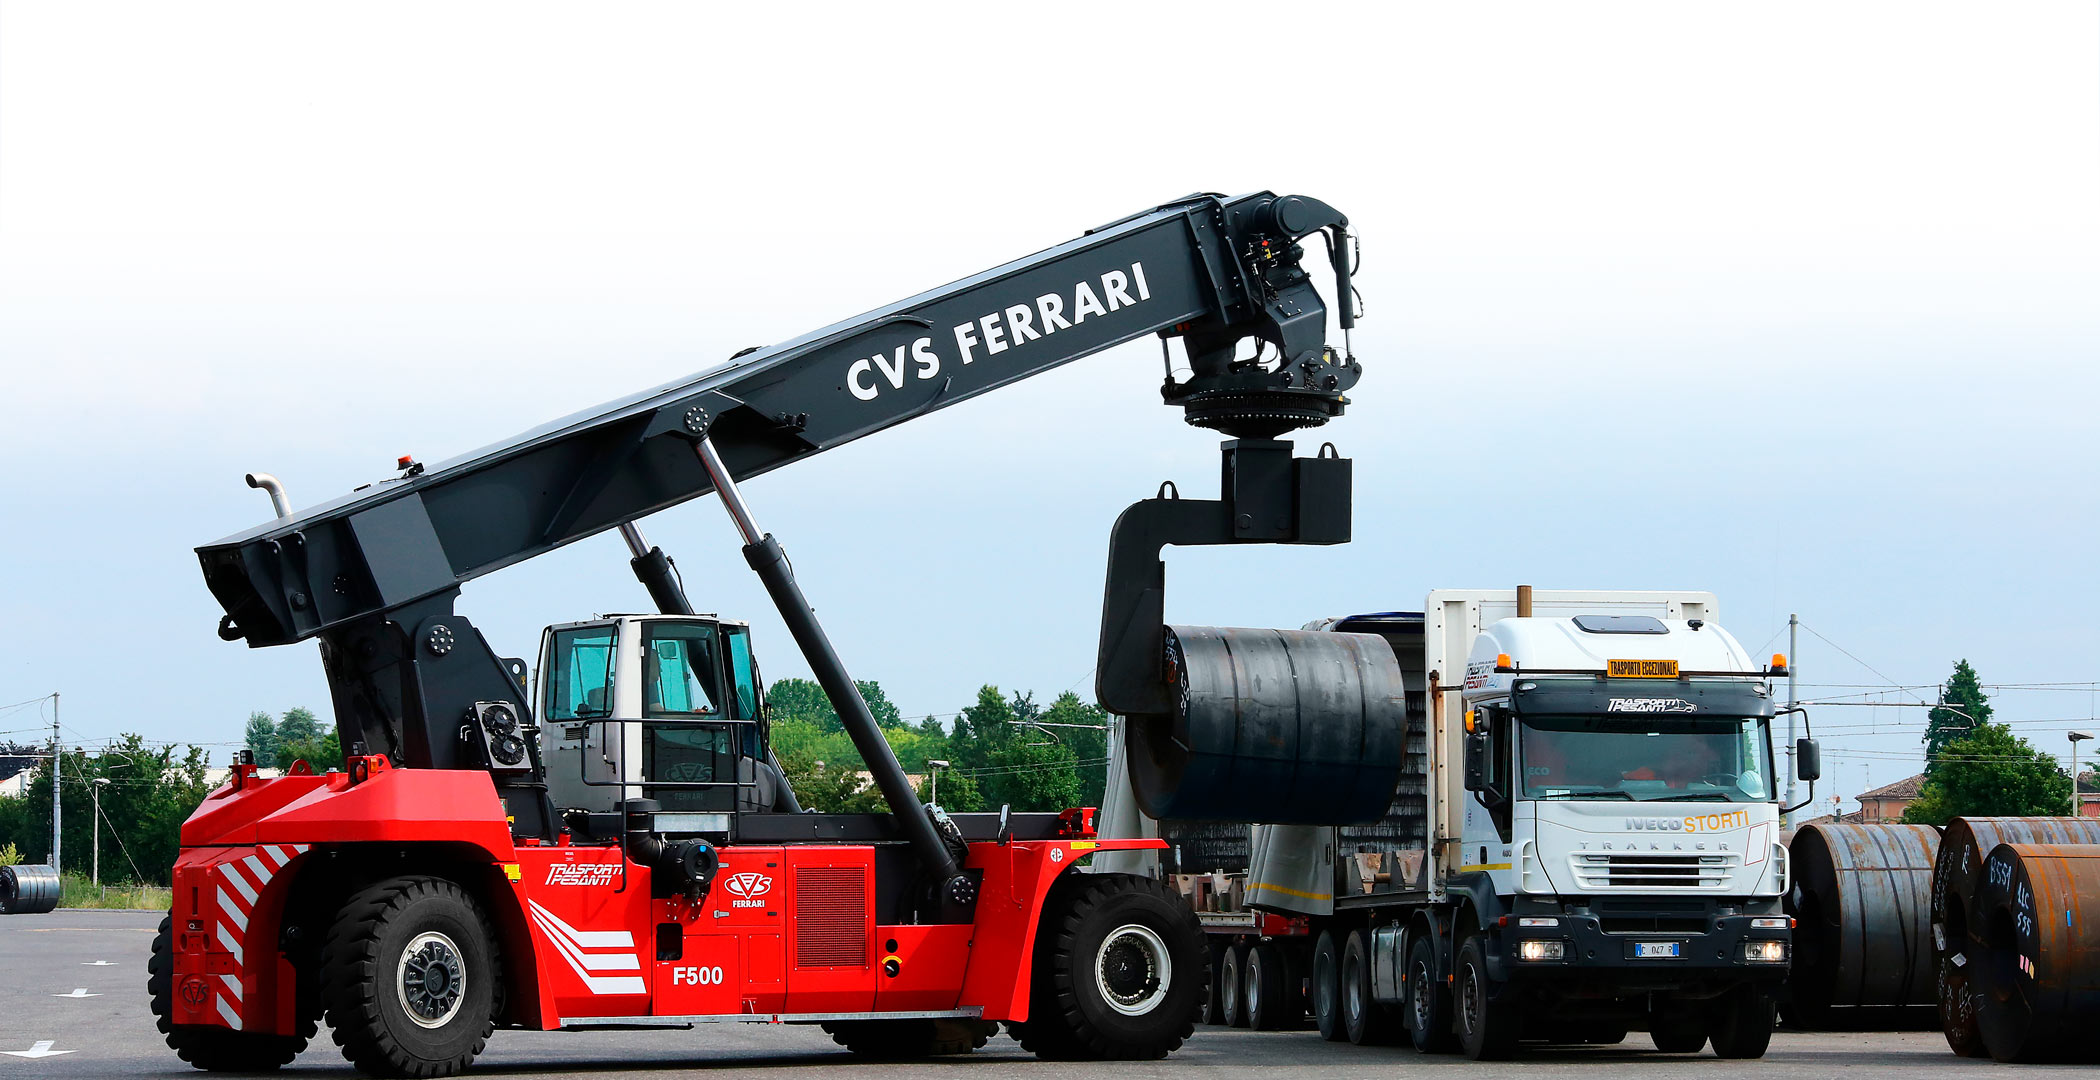 CVSFERRARI - F500